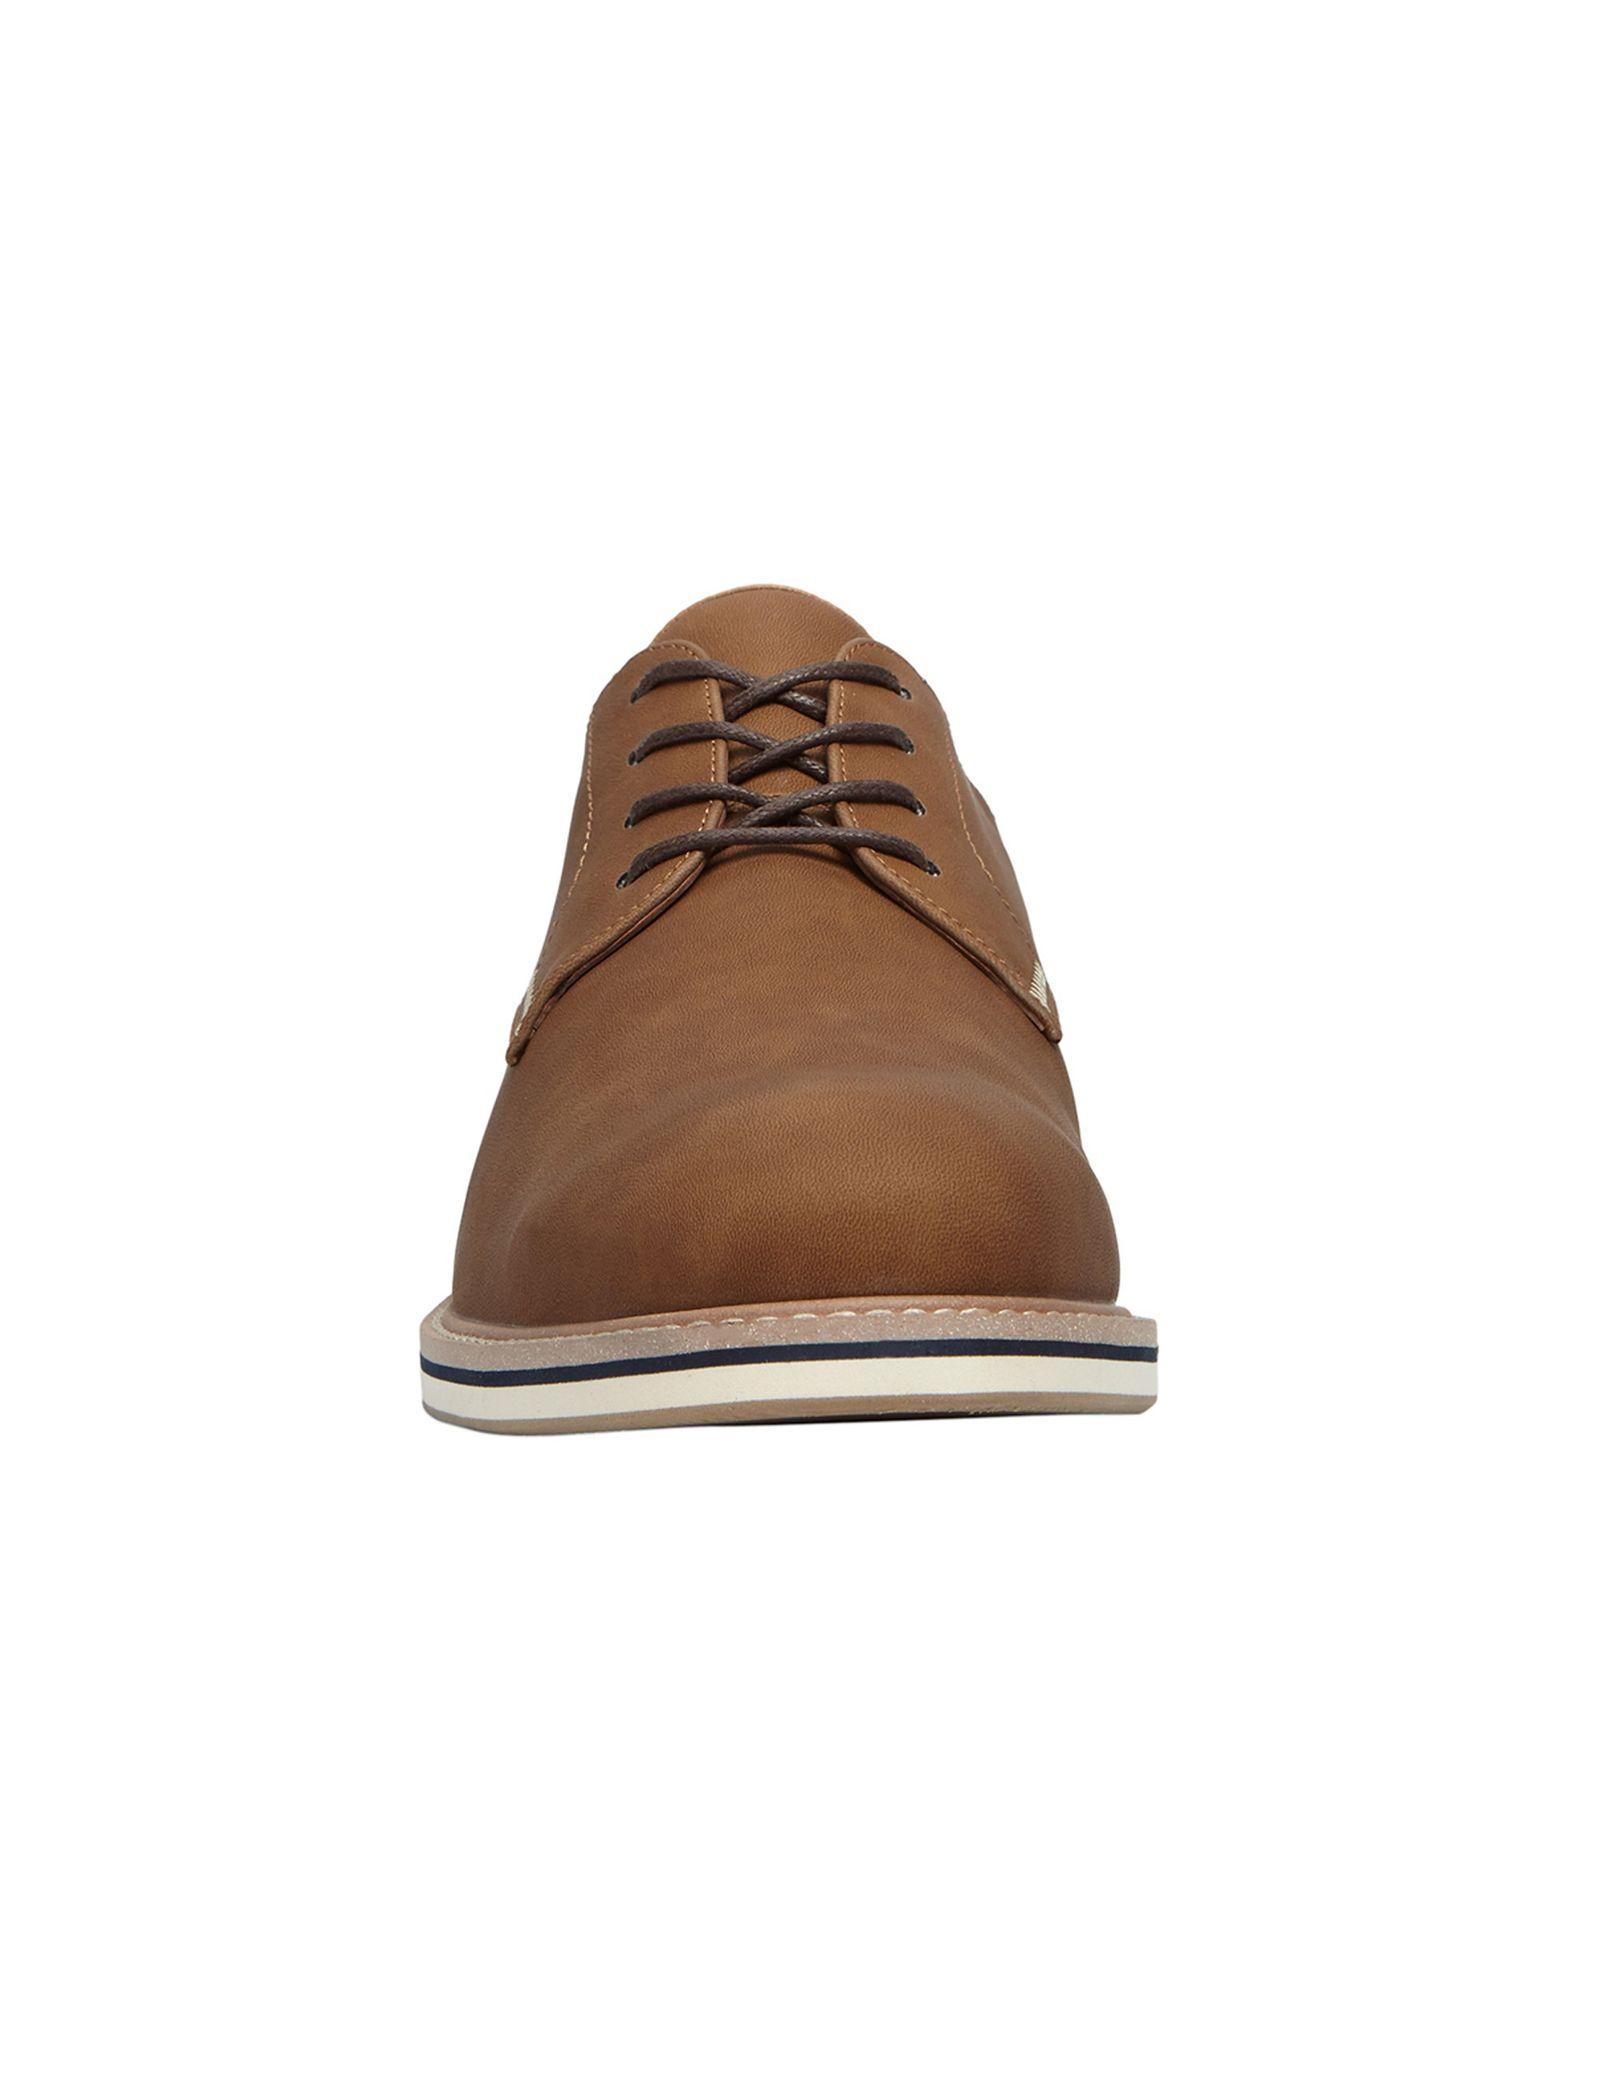 کفش اداری مردانه - کال ایت اسپرینگ - قهوه اي - 2